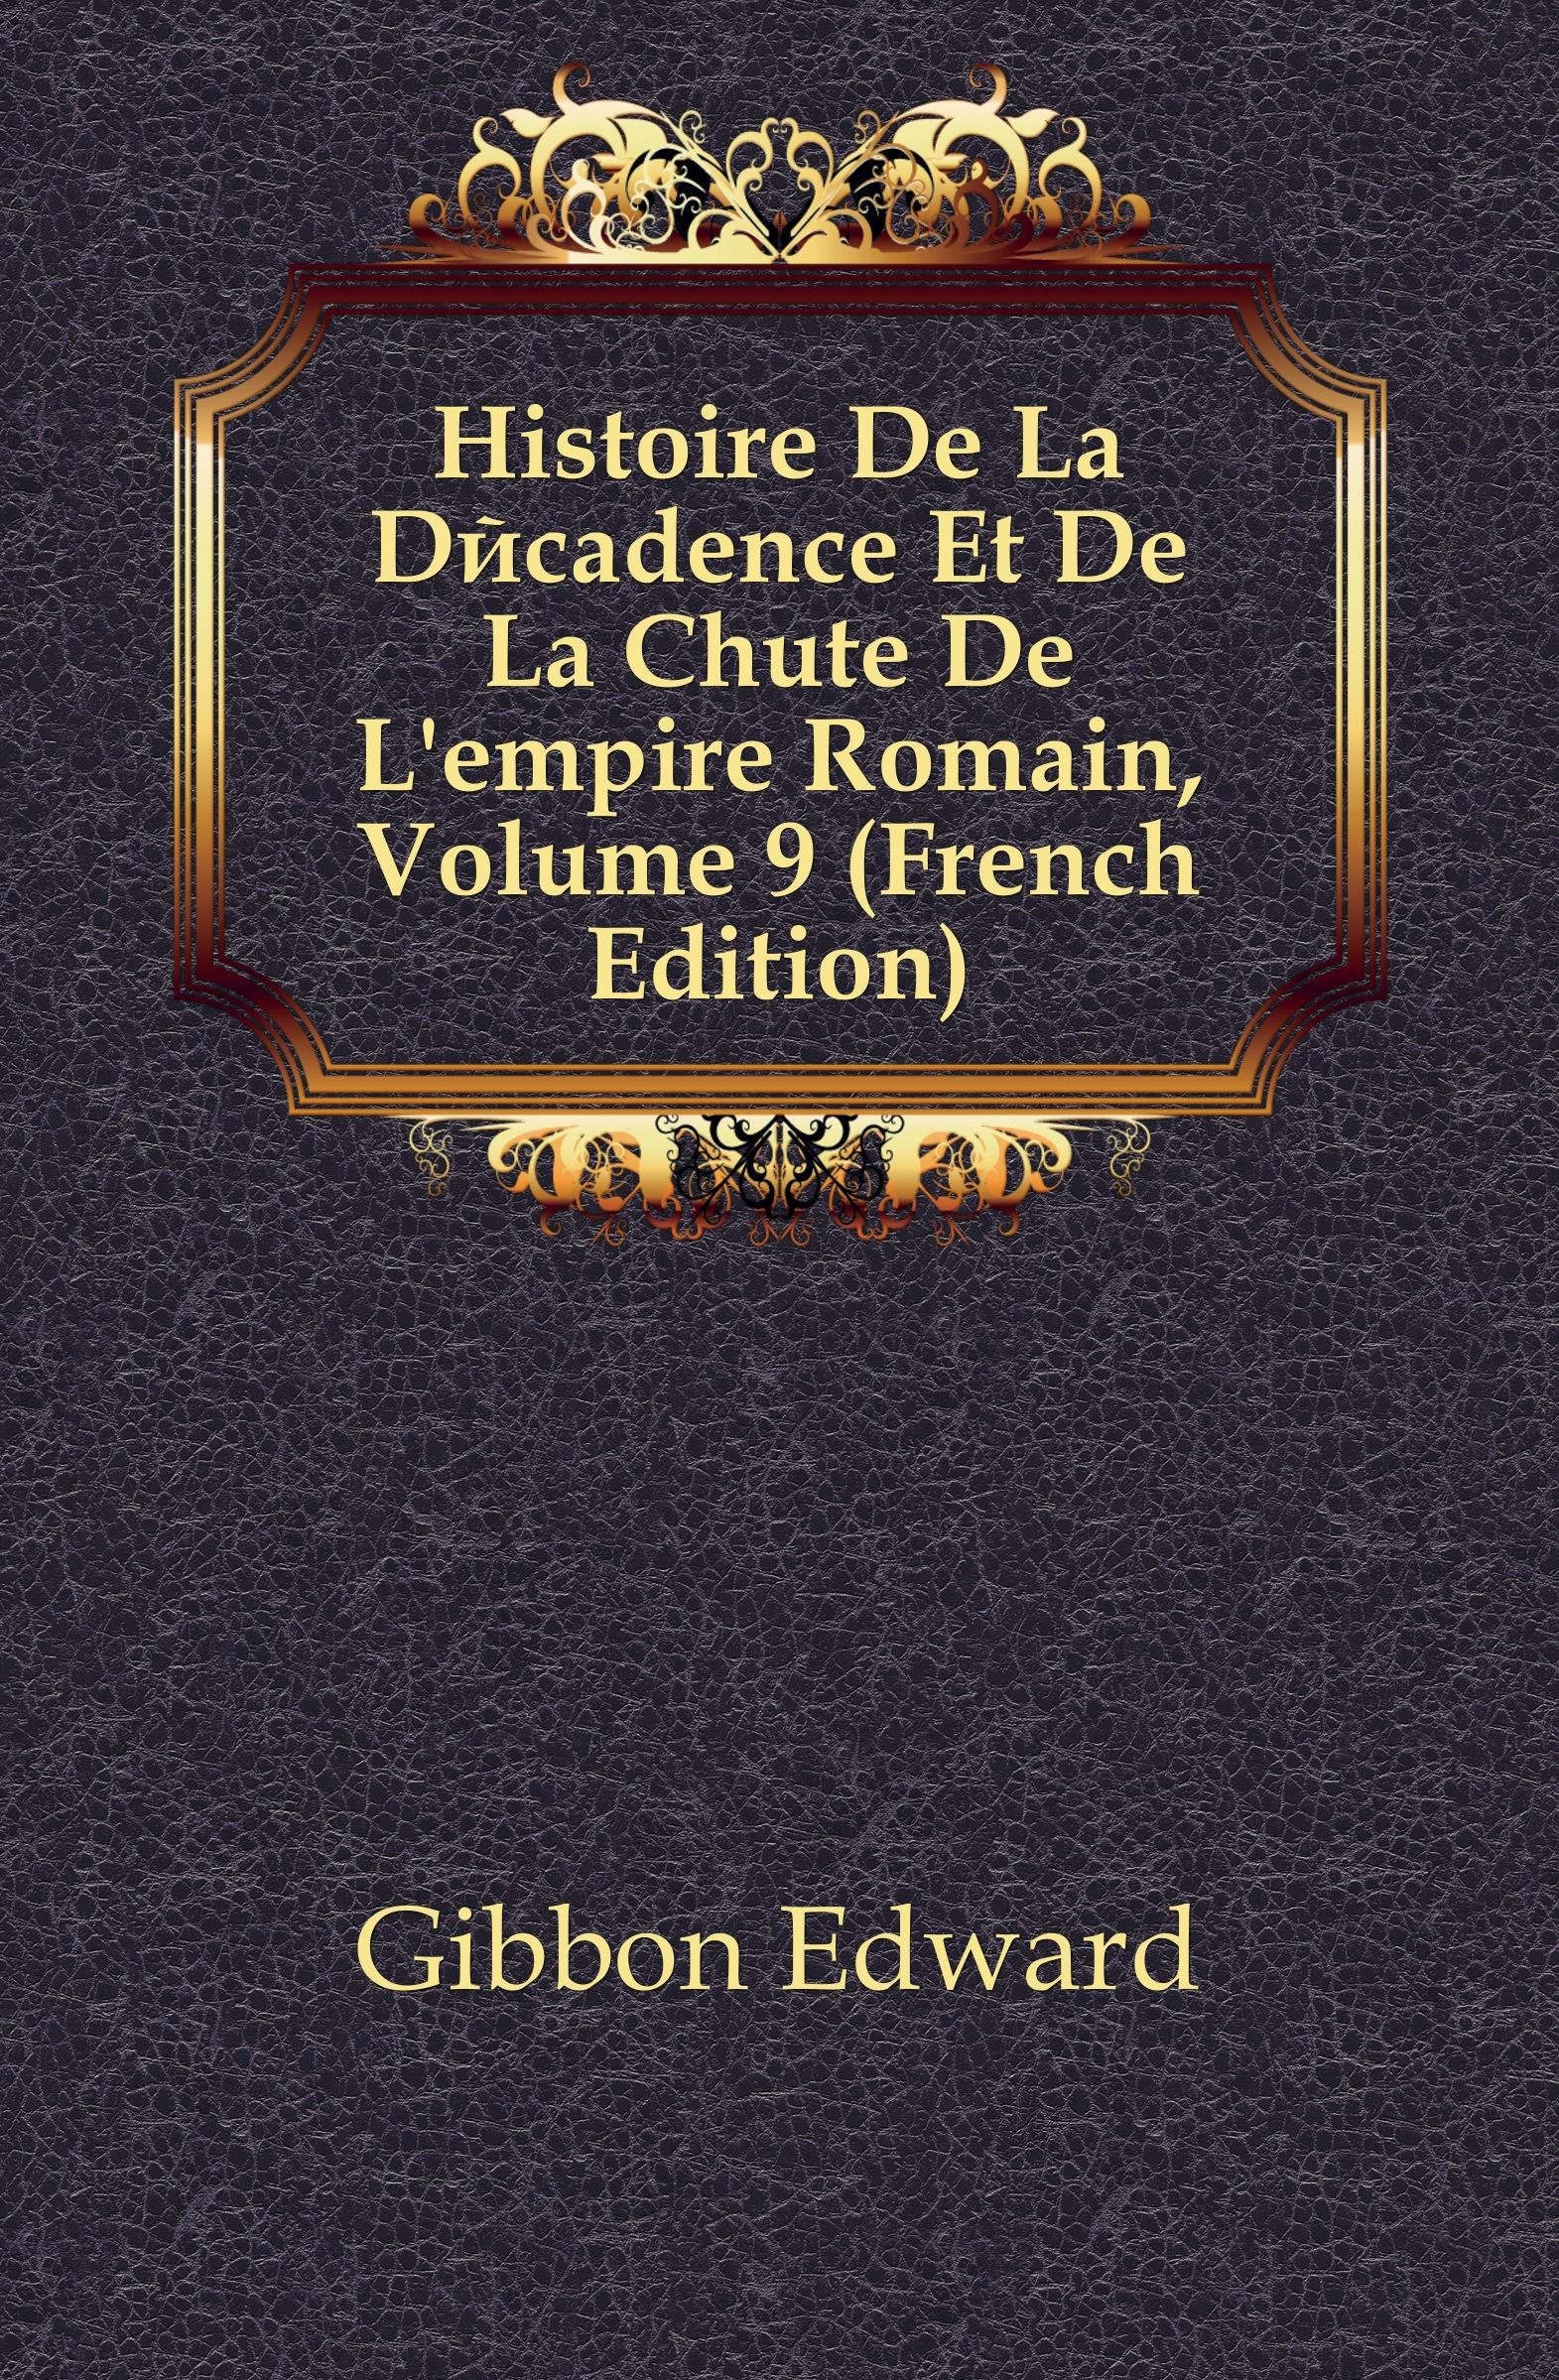 Edward Gibbon Histoire De La Decadence Et De La Chute De L.empire Romain, Volume 9